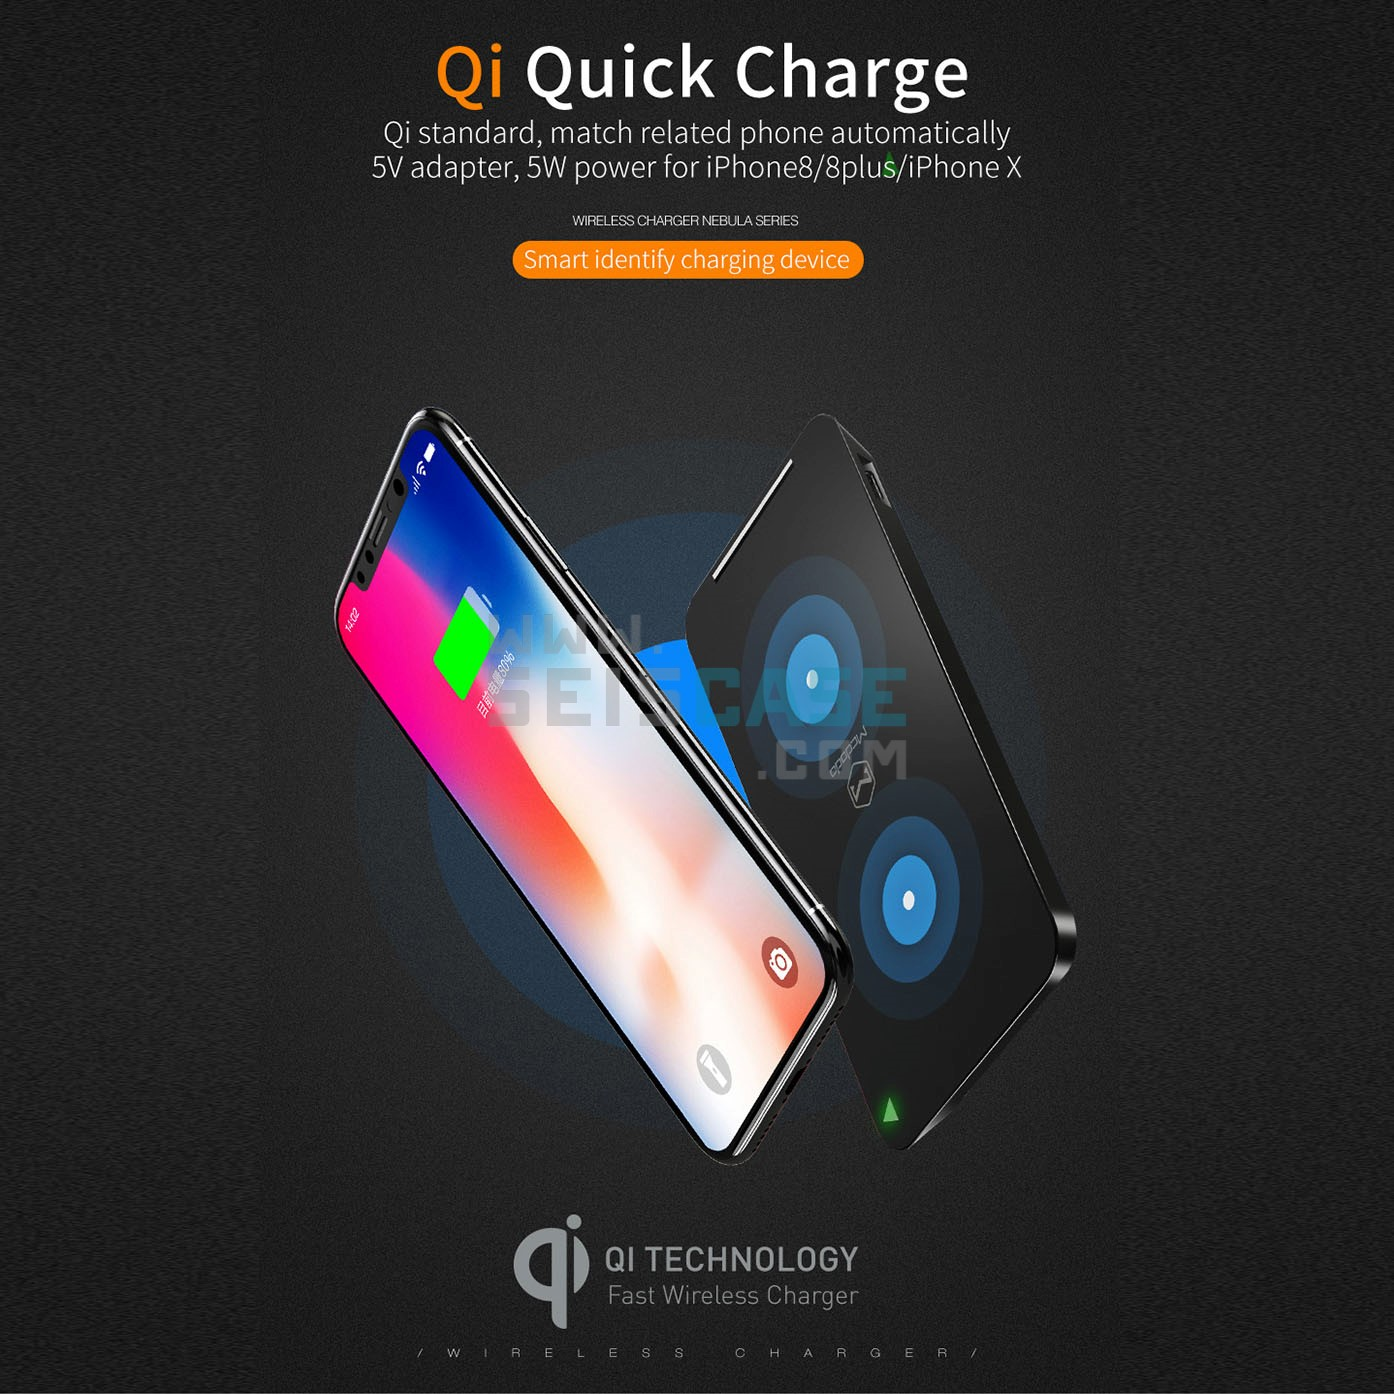 new product 55502 fda6d MCDODO iPhone 8 Plus X Nebula Qi Quick Charge Wireless Charging Pad